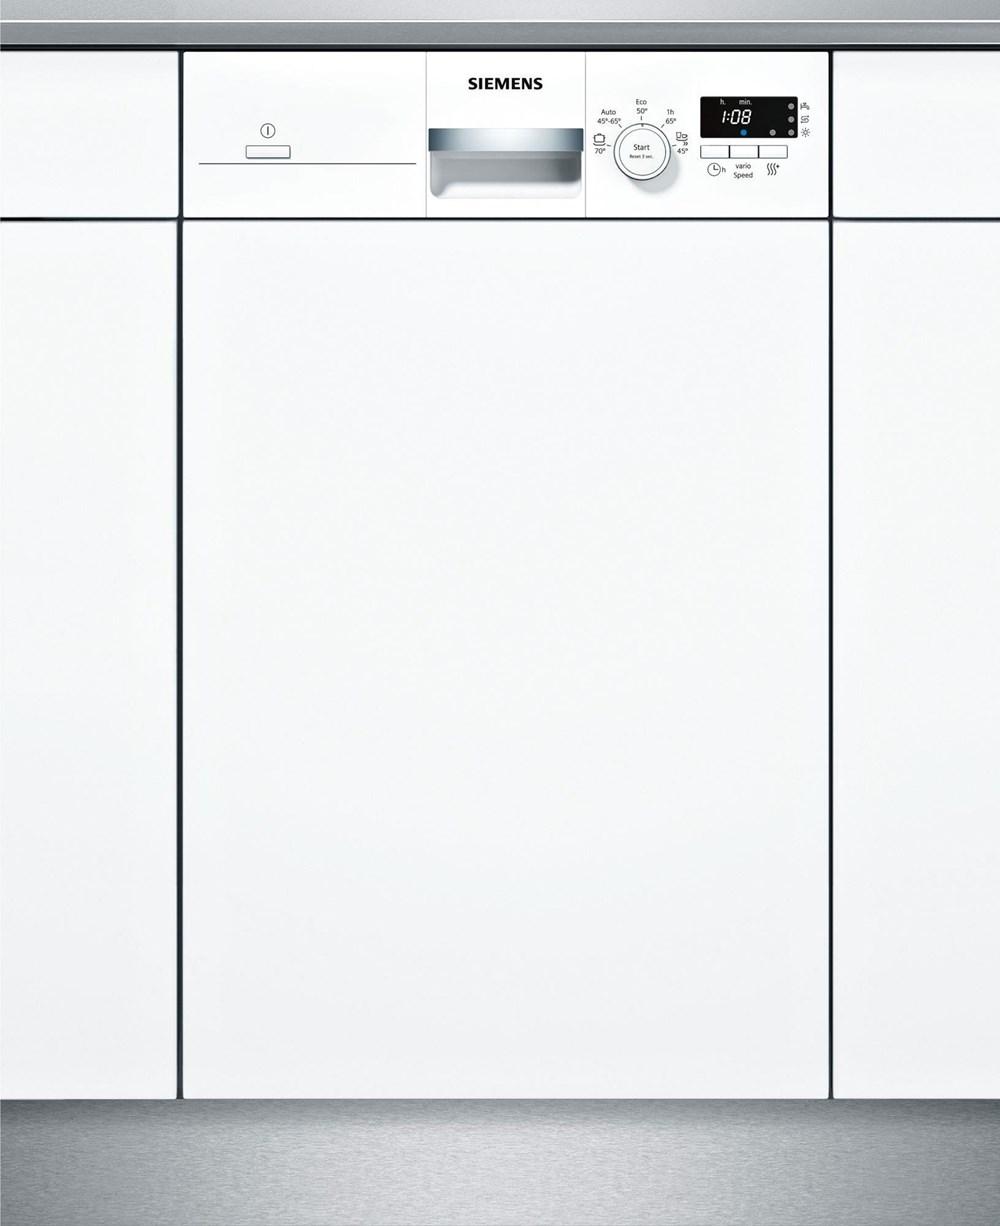 Siemens SR515W03CE Integrierbar weiß speedMatic45